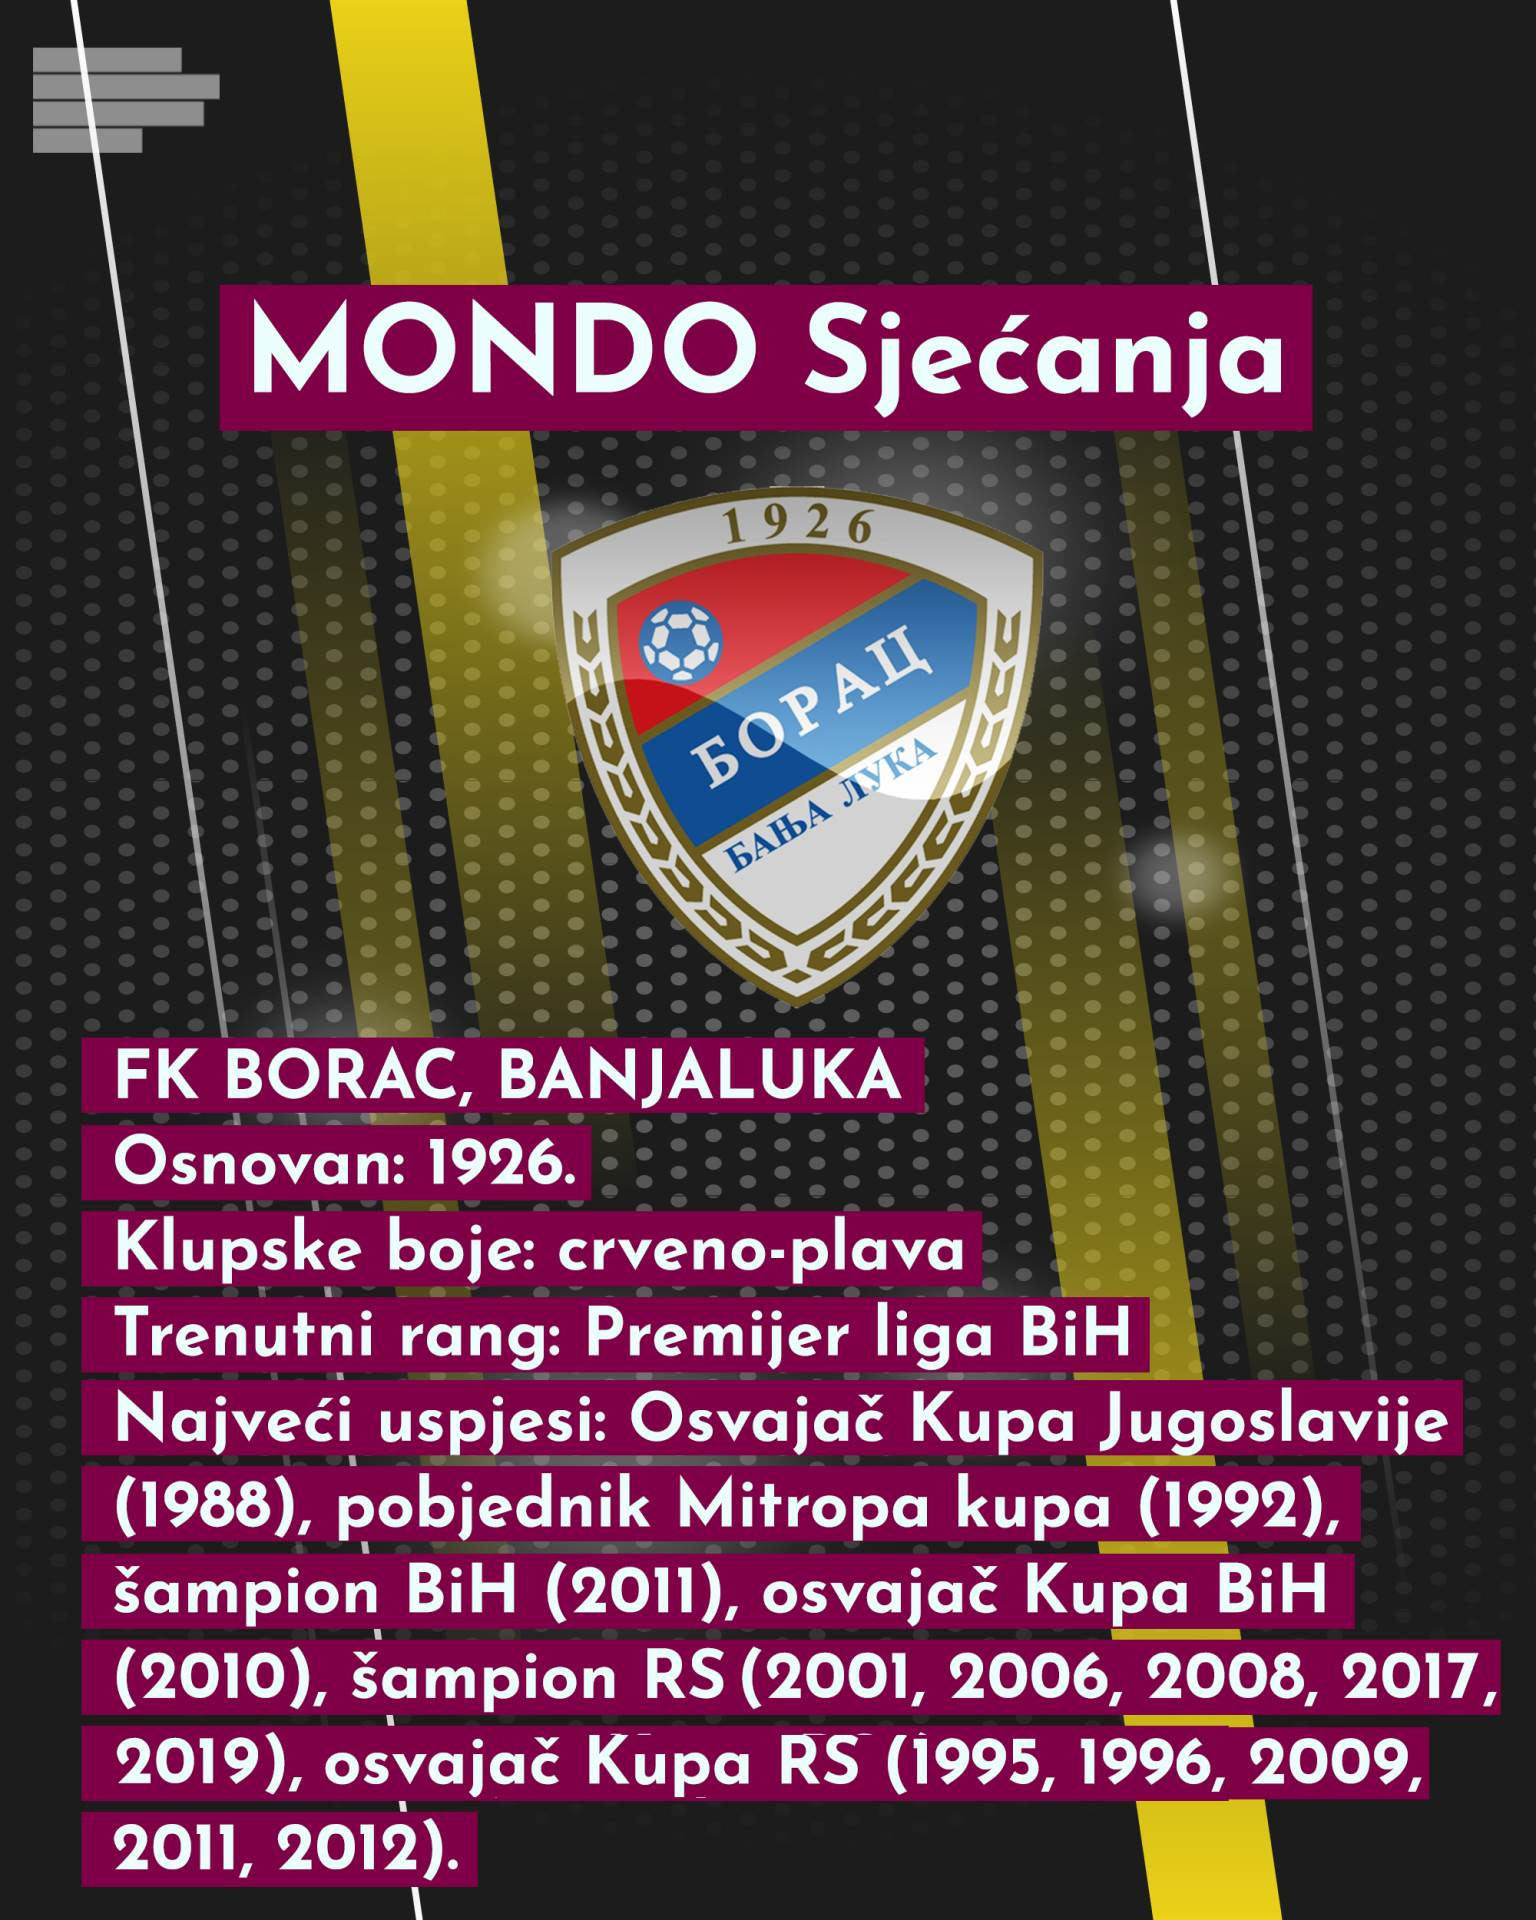 FK Borac Banjaluka - MONDO Sjećanja